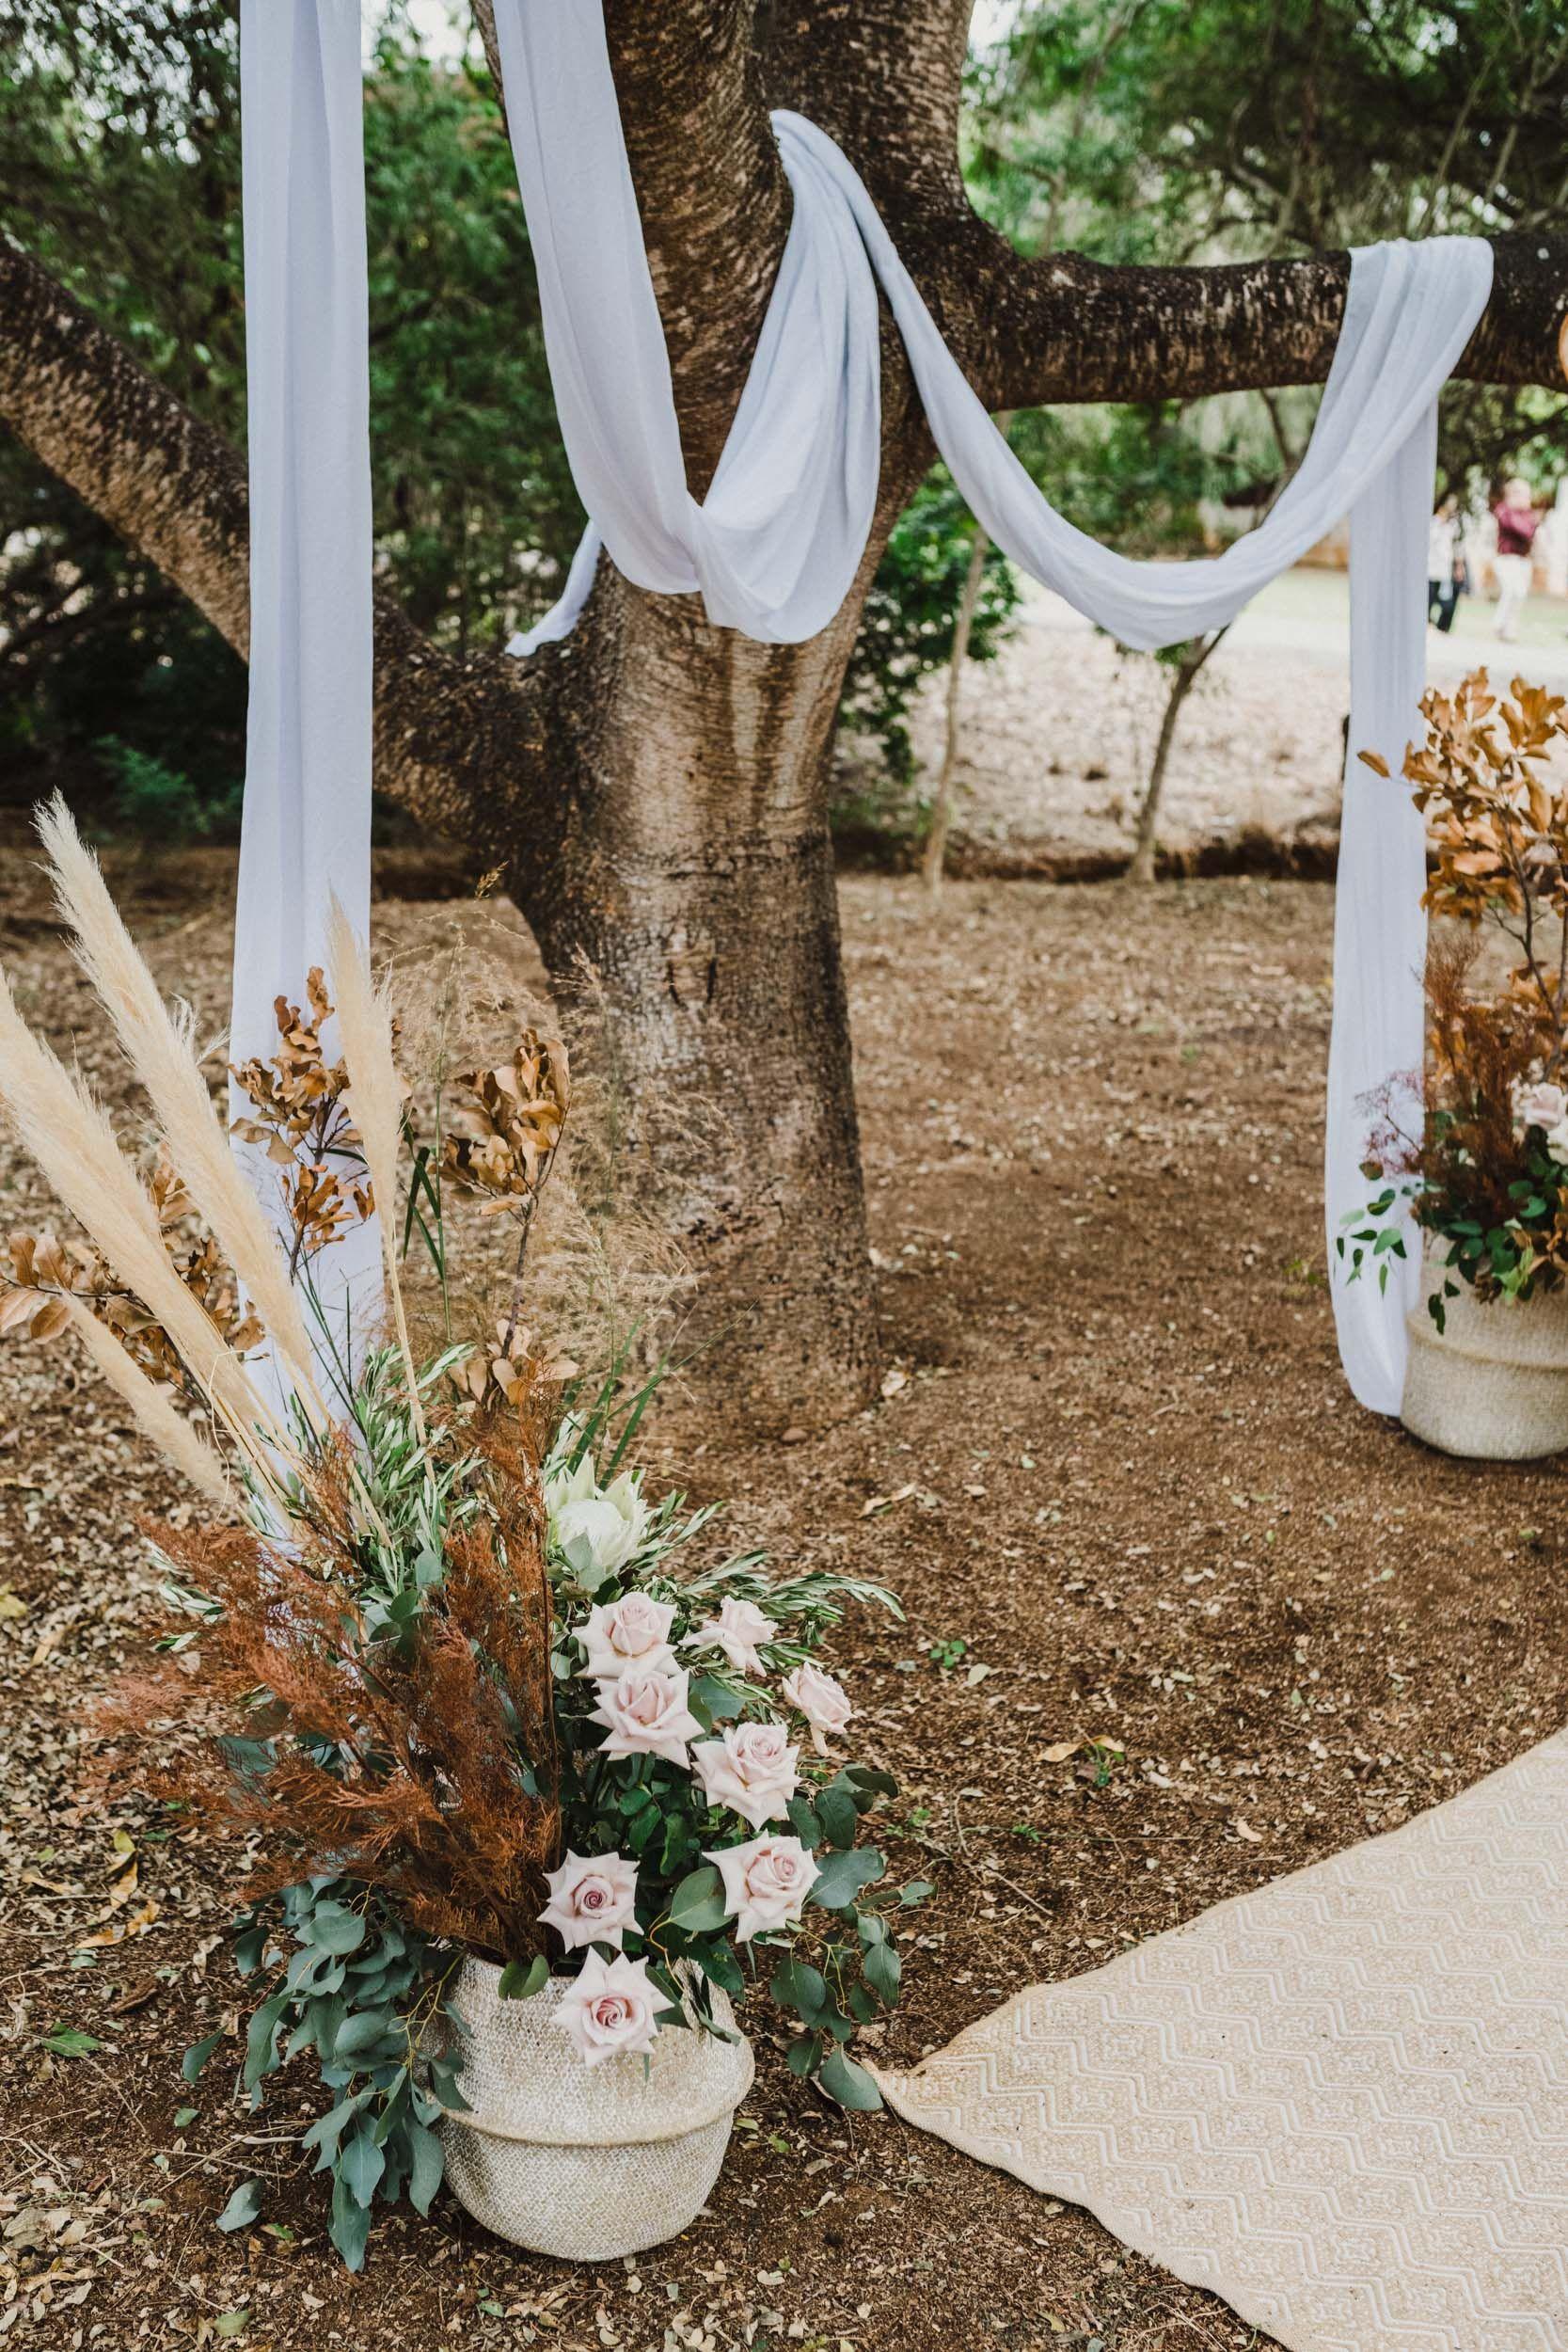 Ceremony Ideas Floral Mareeba Wedding Venue Photography Australian Wedding Photographer Country Wedding Inspiration Backyard Wedding Creative Wedding Photo